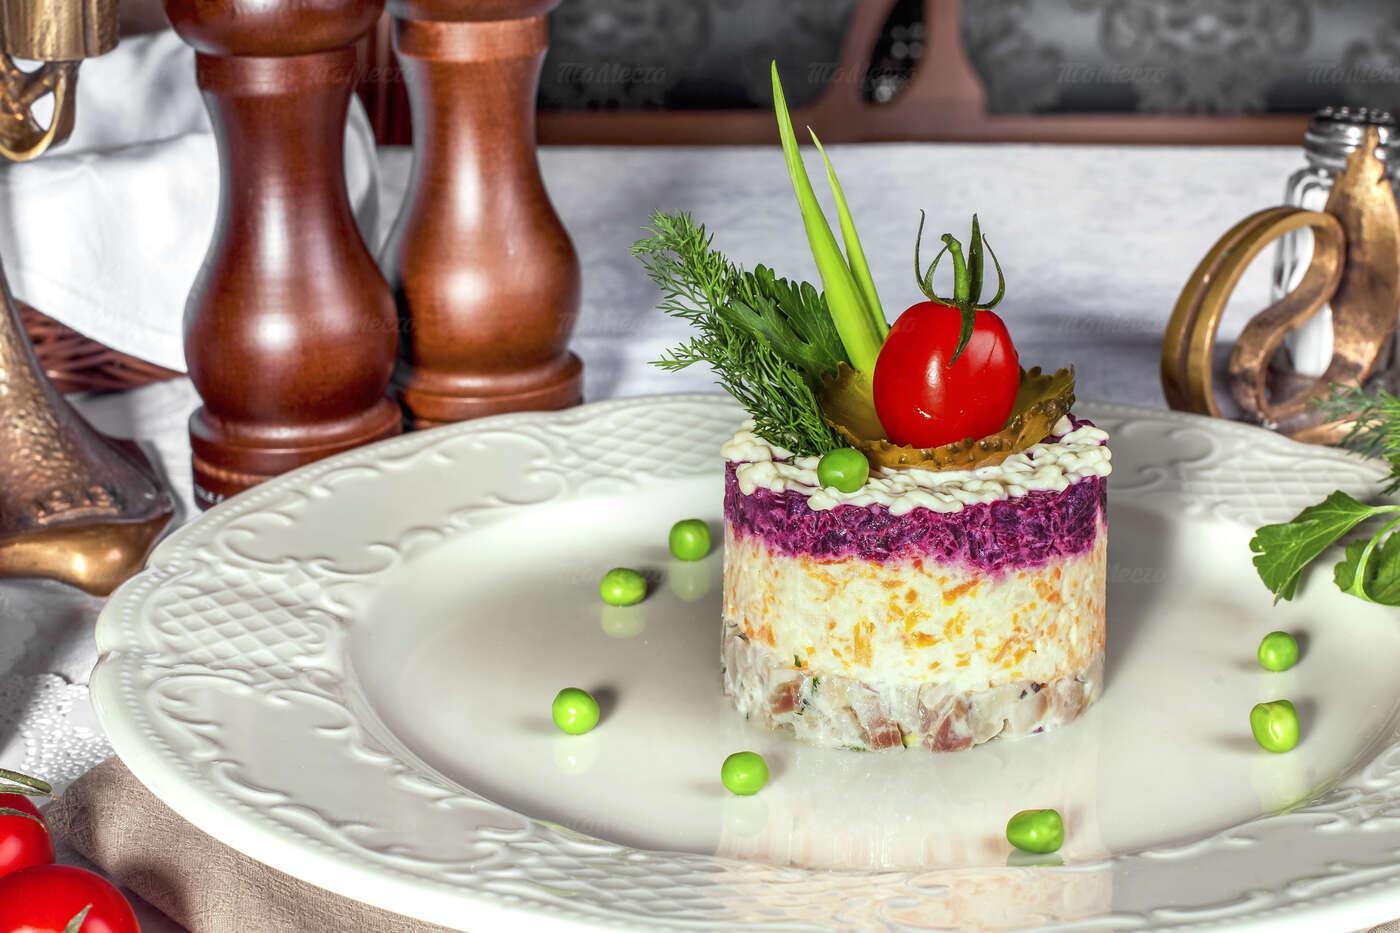 Меню ресторана 1913 год на Вознесенском проспекте фото 20